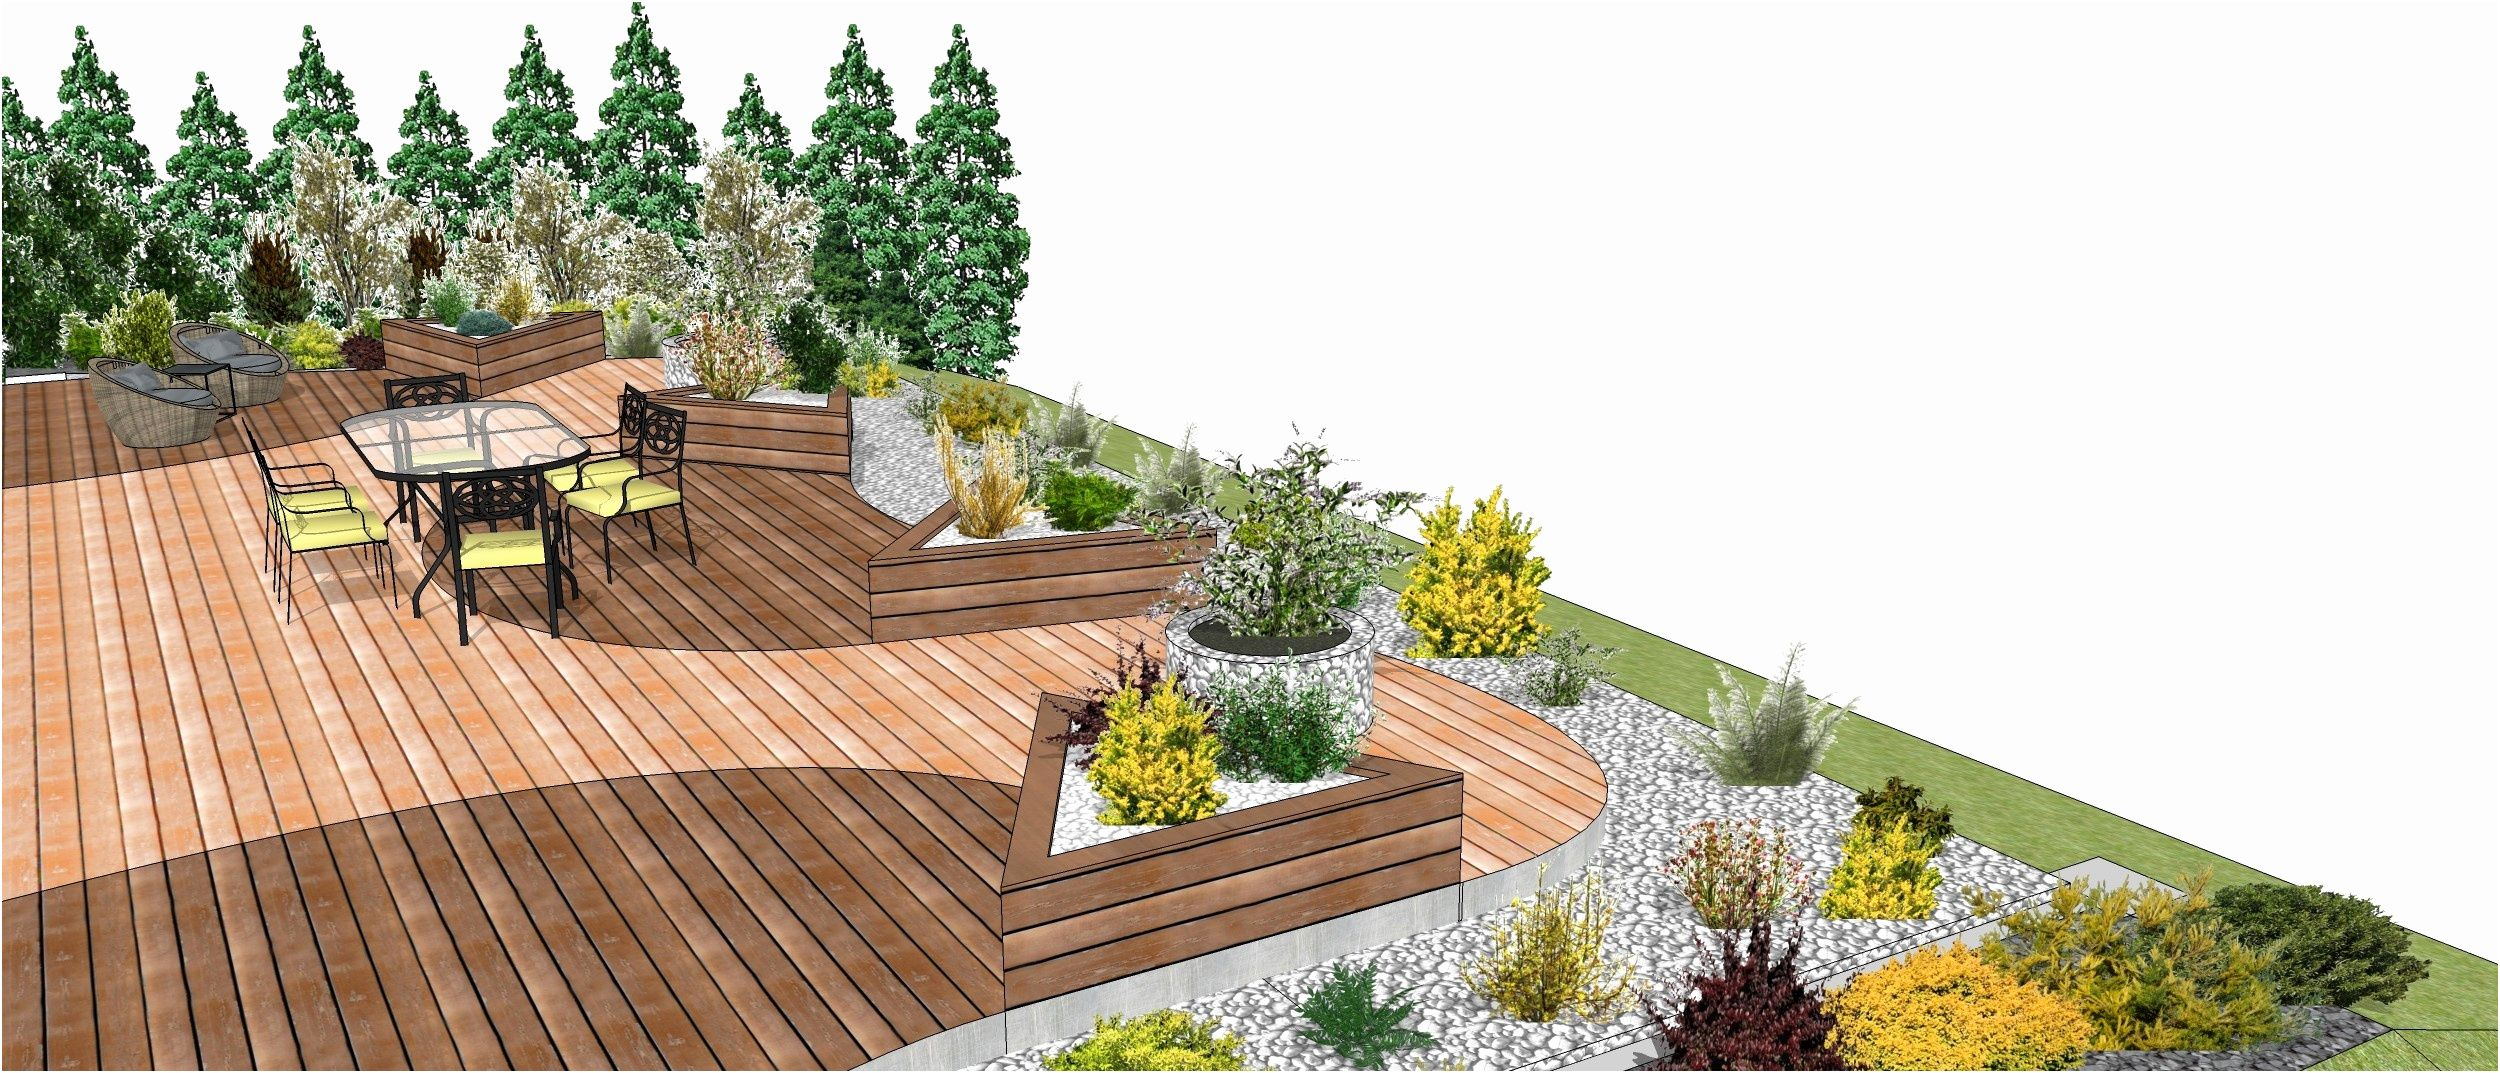 Jardin Nice Unique Idee Jardin Sans Entretien Inspirant Outil De Jardinage